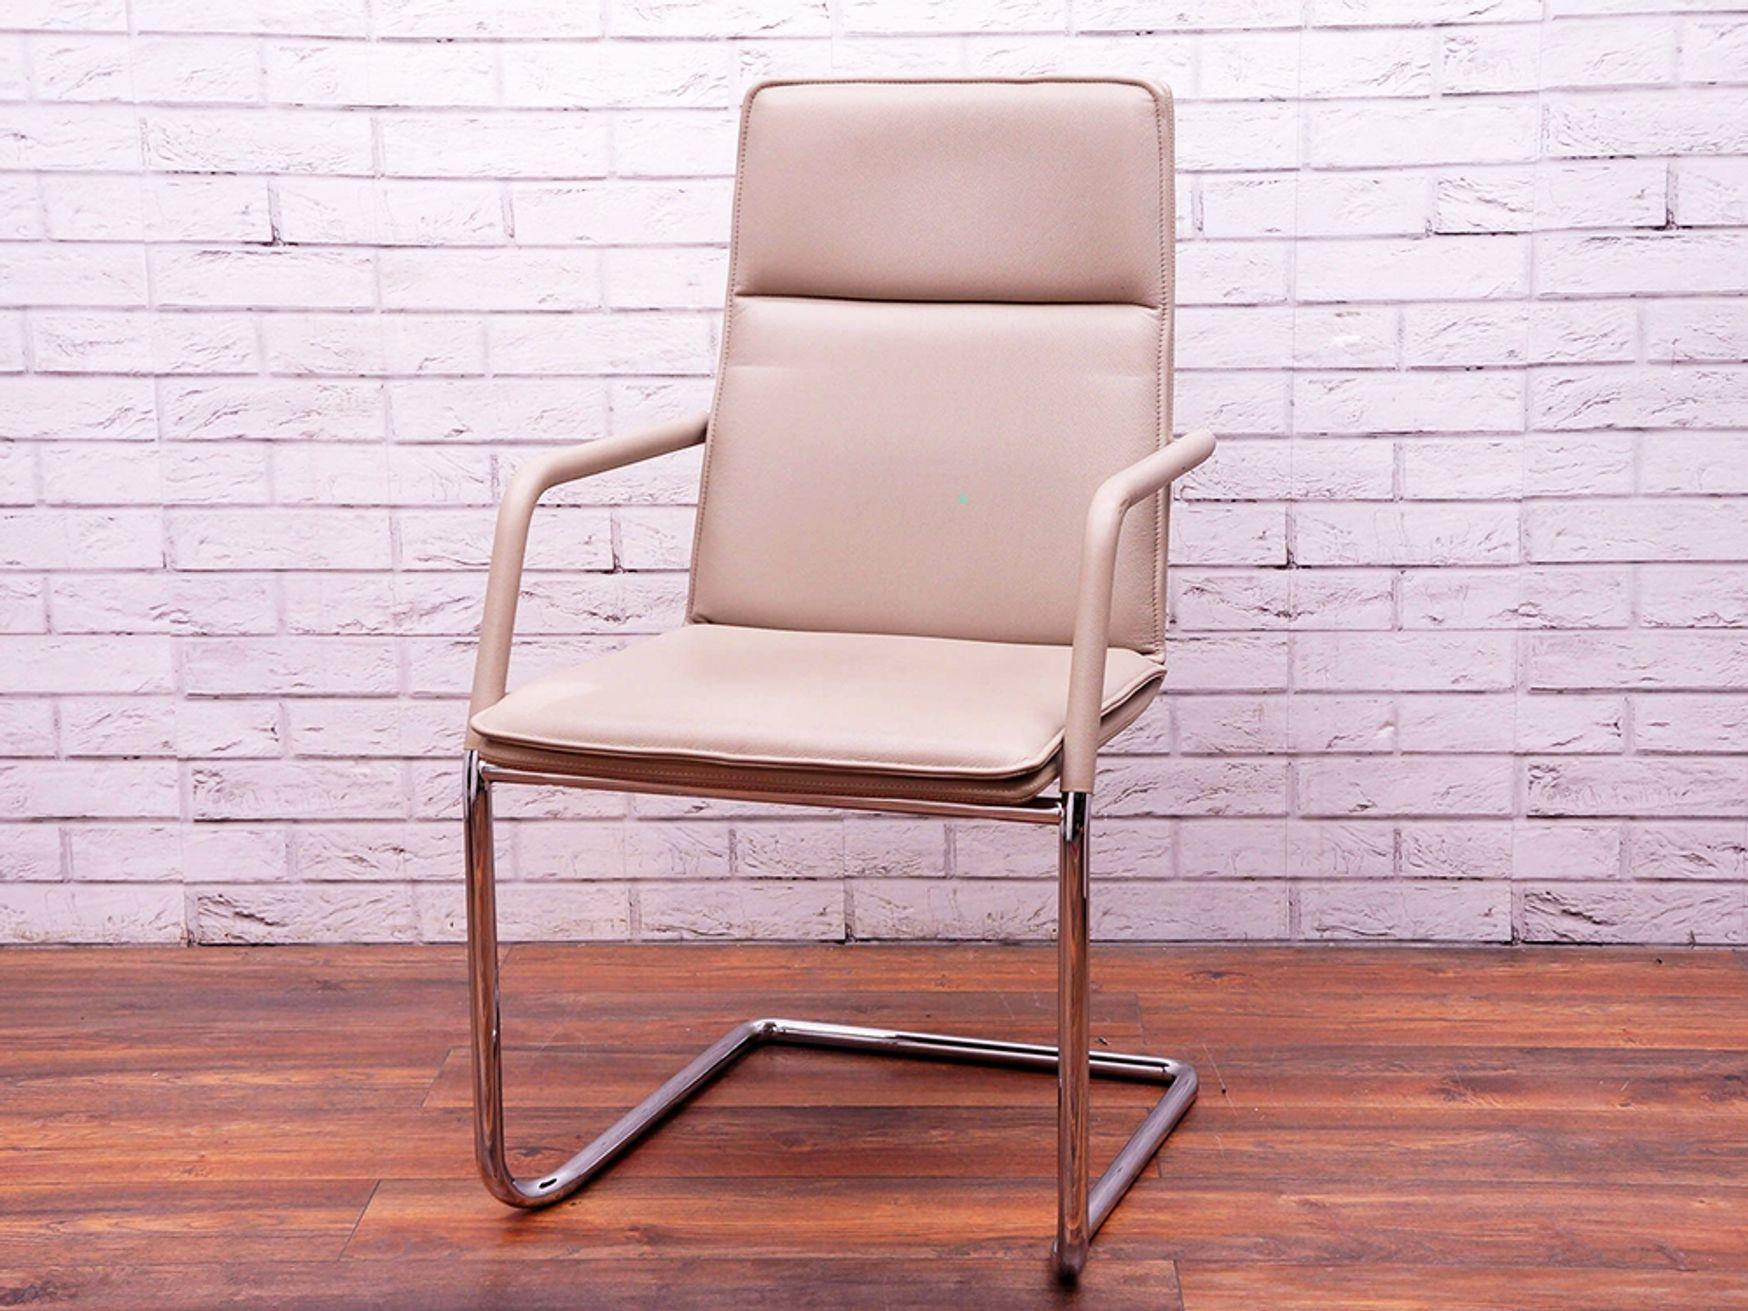 Used Brunner 'Finasoft 6722' Cantilever Chair